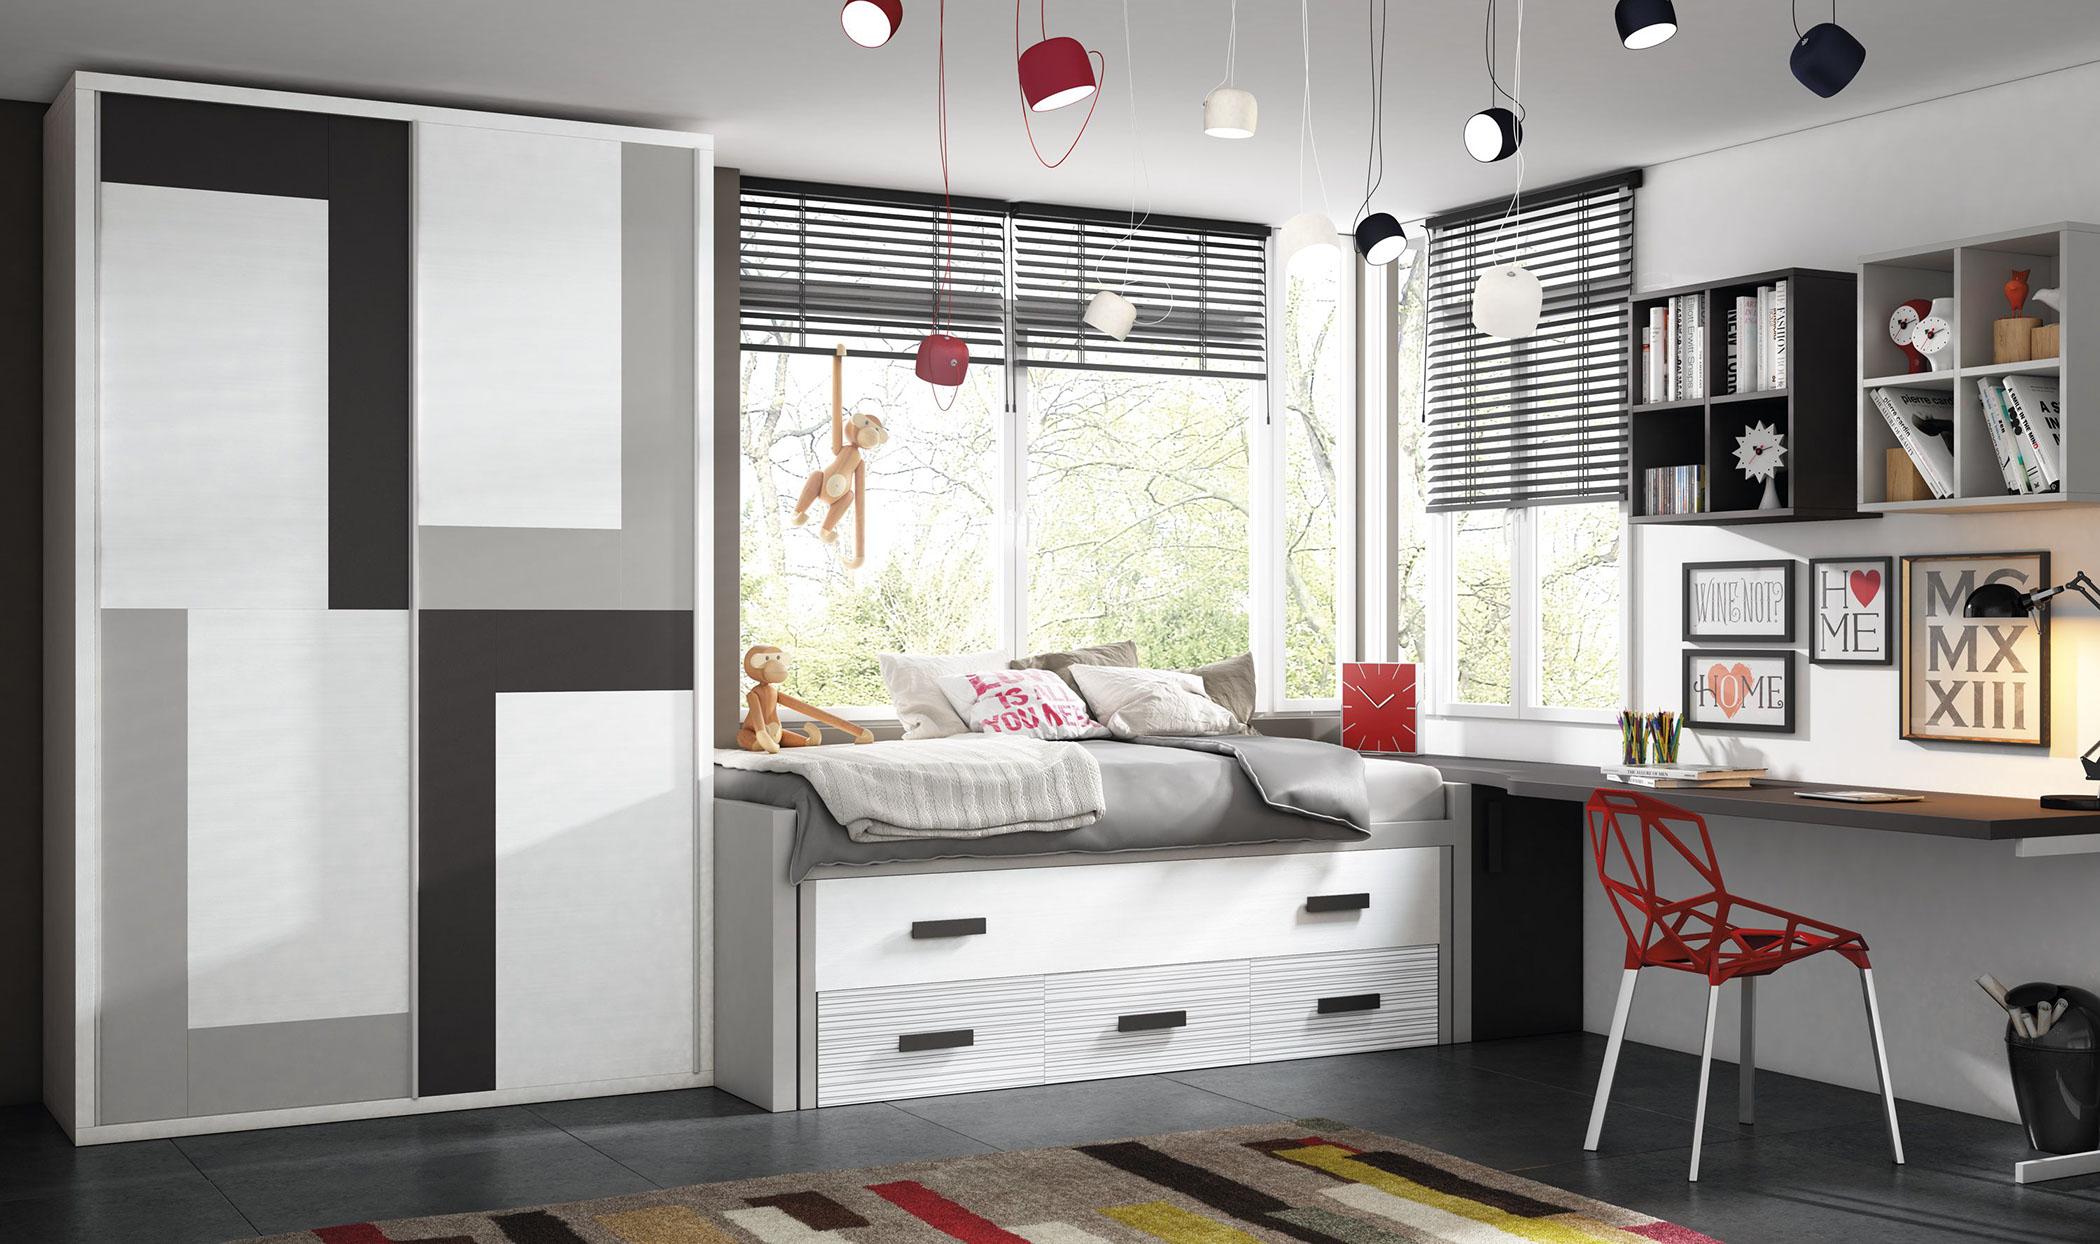 Fabricantes de muebles for Muebles fabricantes